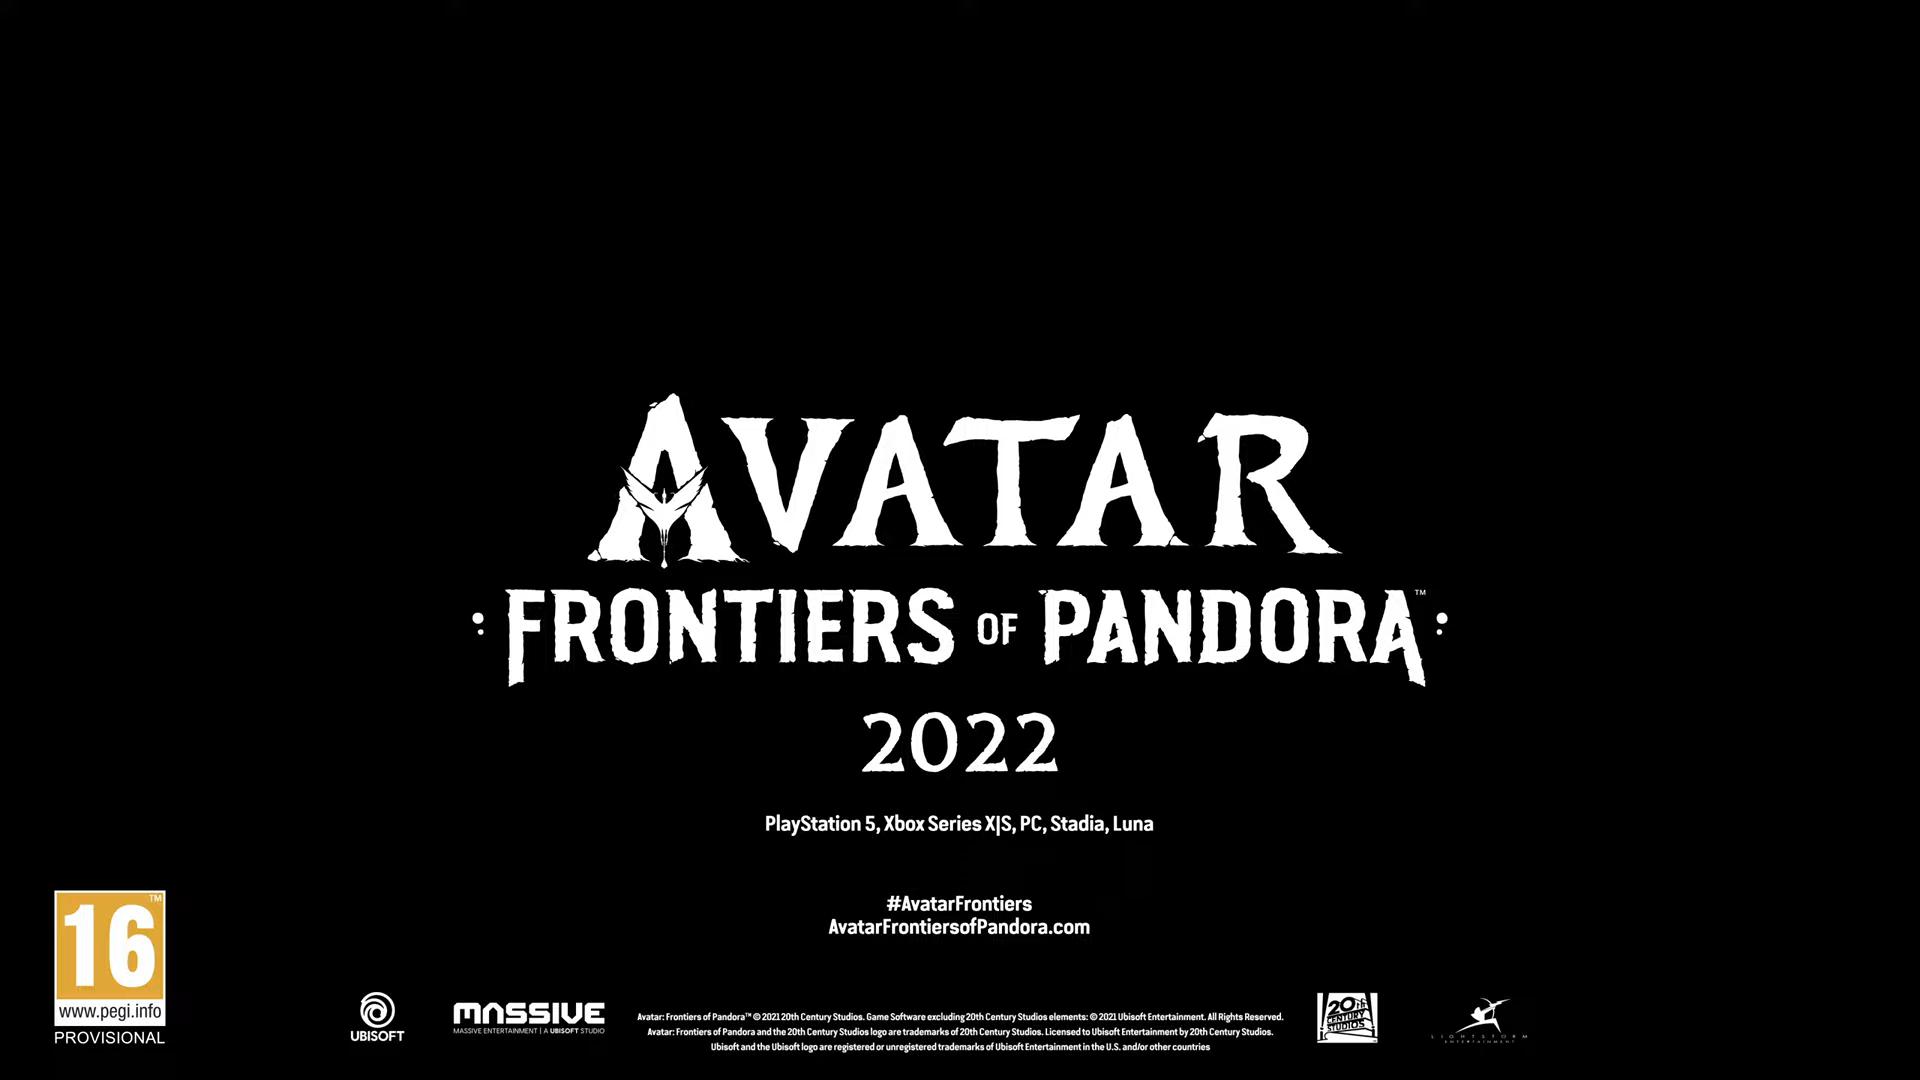 Avatar_ Frontiers of Pandora – First Look Trailer 2-42 screenshot.png